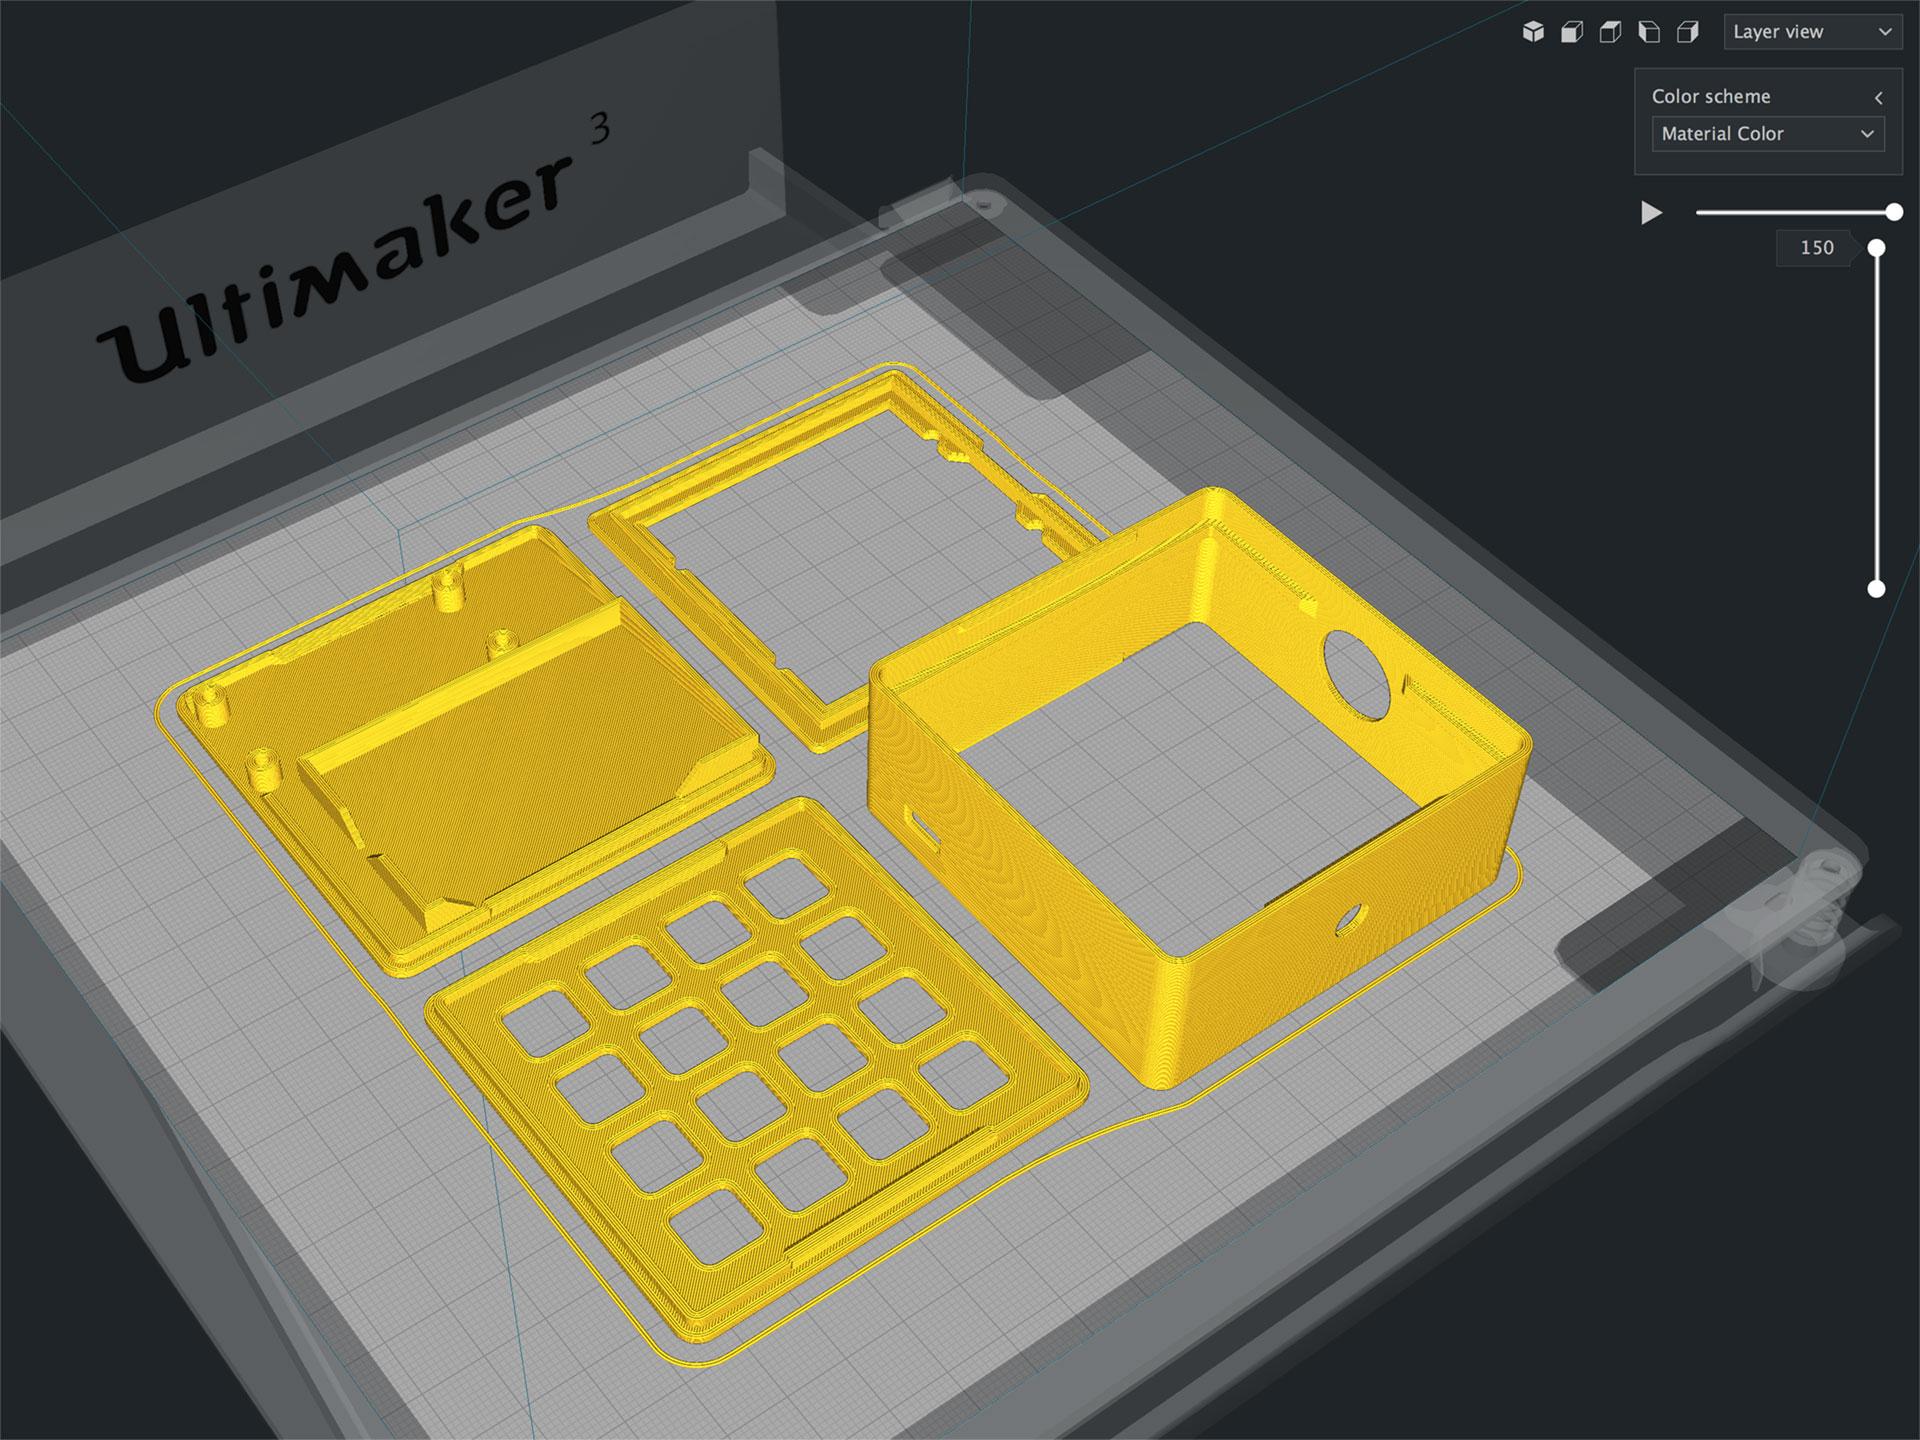 leds_3d_printing_cura-preview.jpg